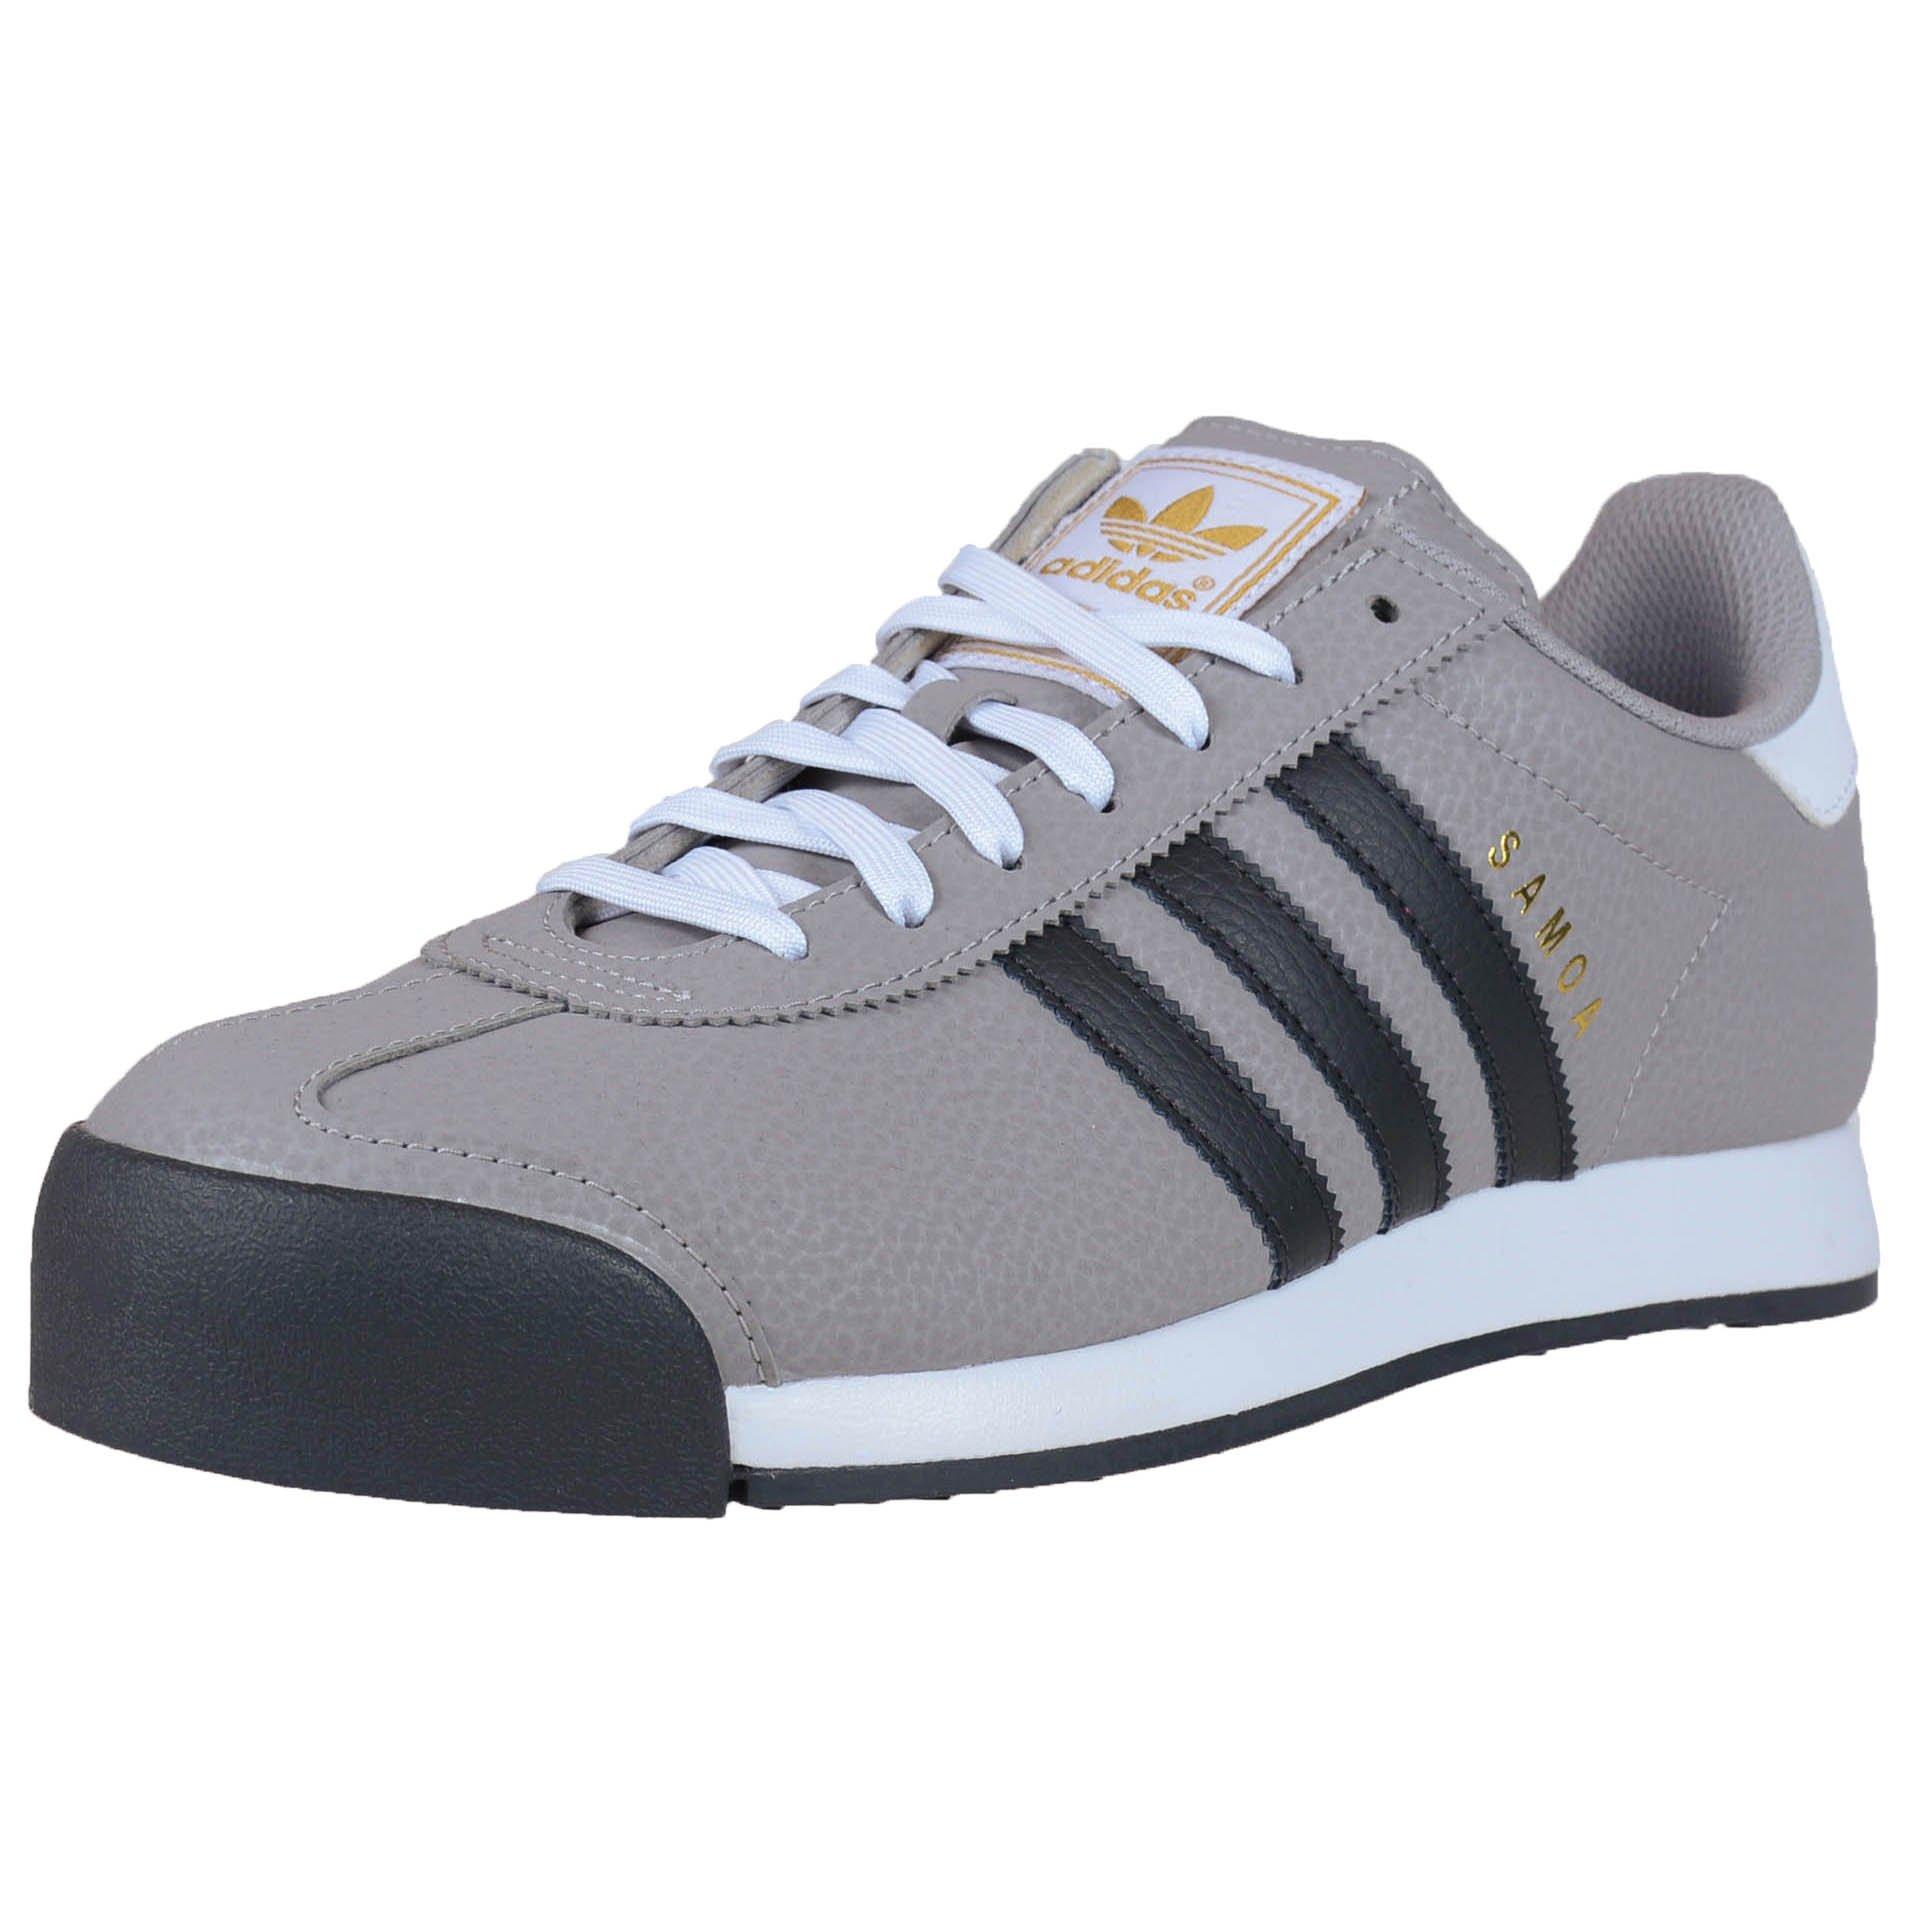 adidas Samoa Mens Shoes Solid Grey